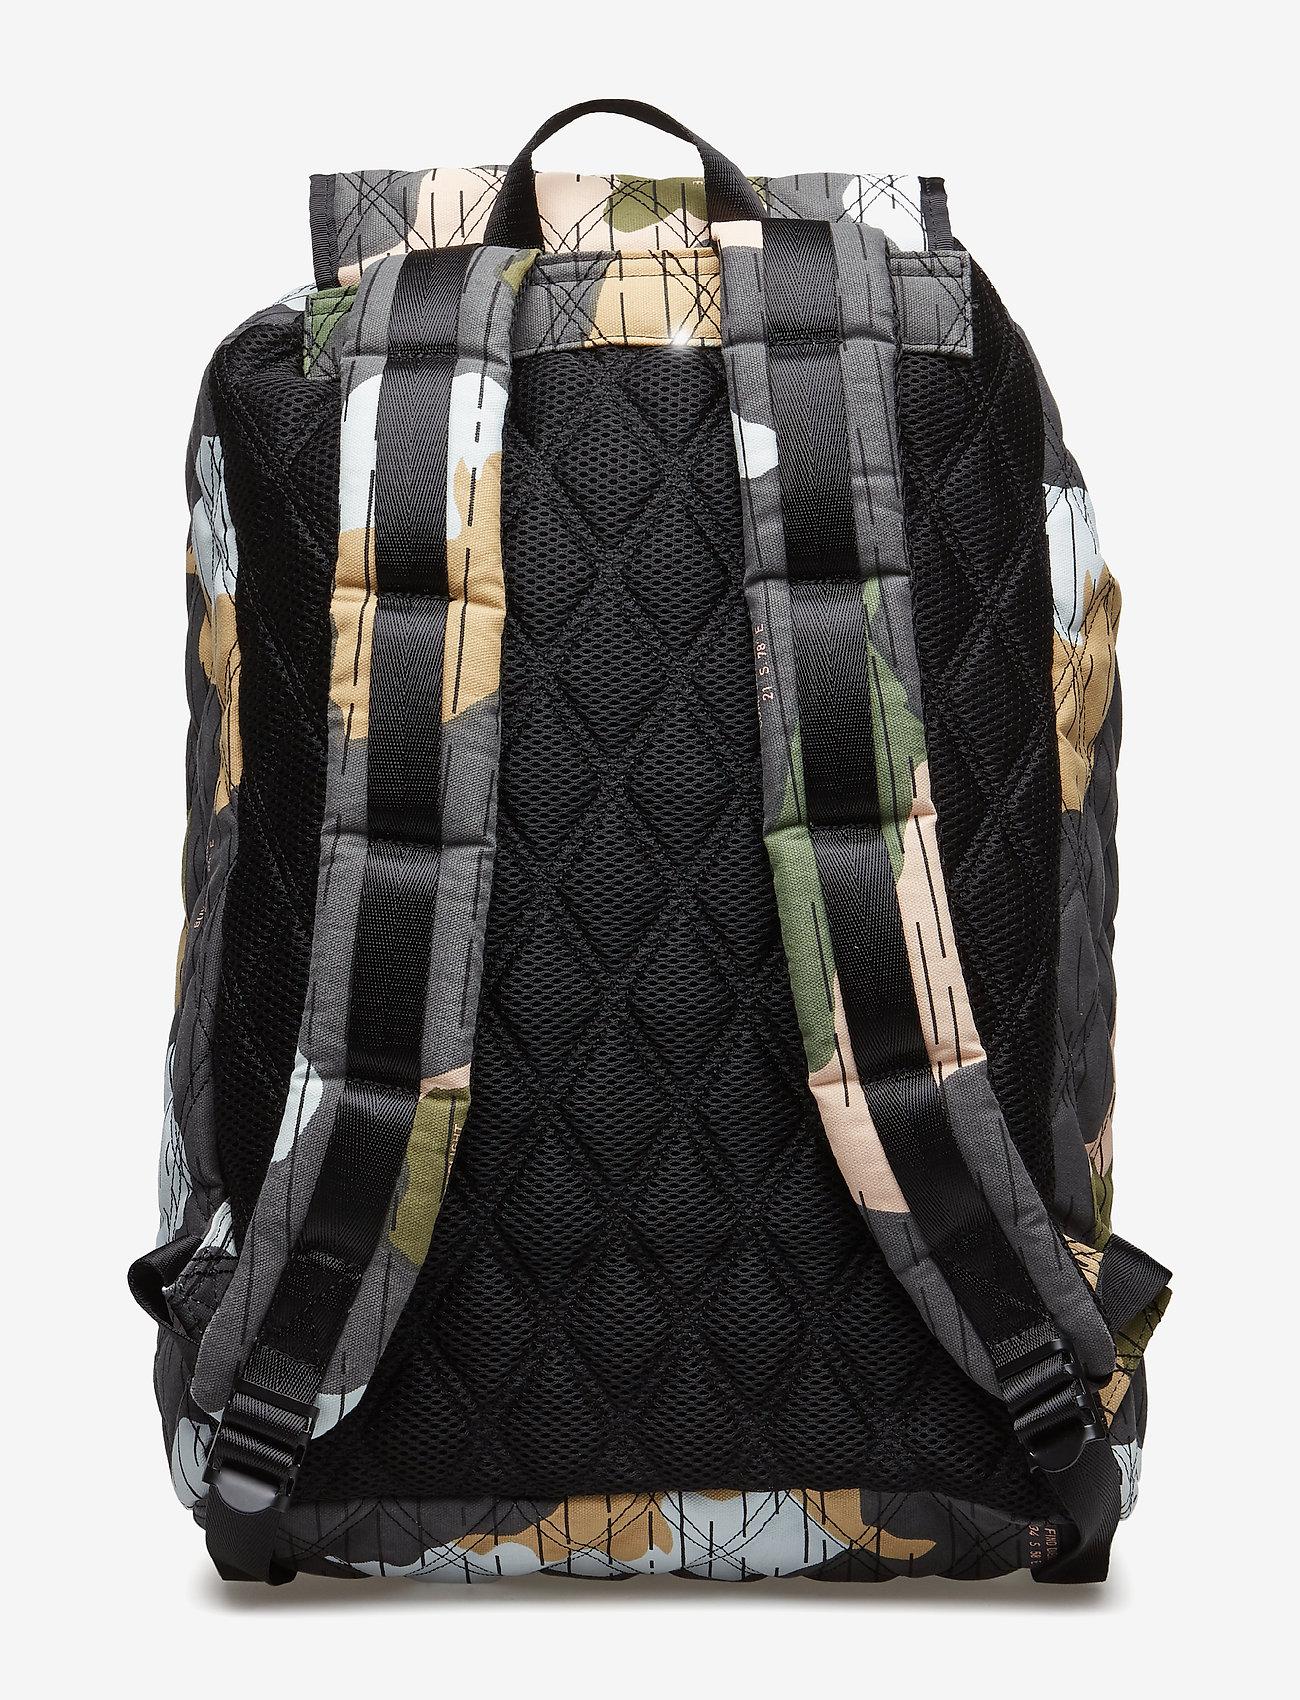 Scotch & Soda - Ams Blauw backpack - backpacks - combo b - 1